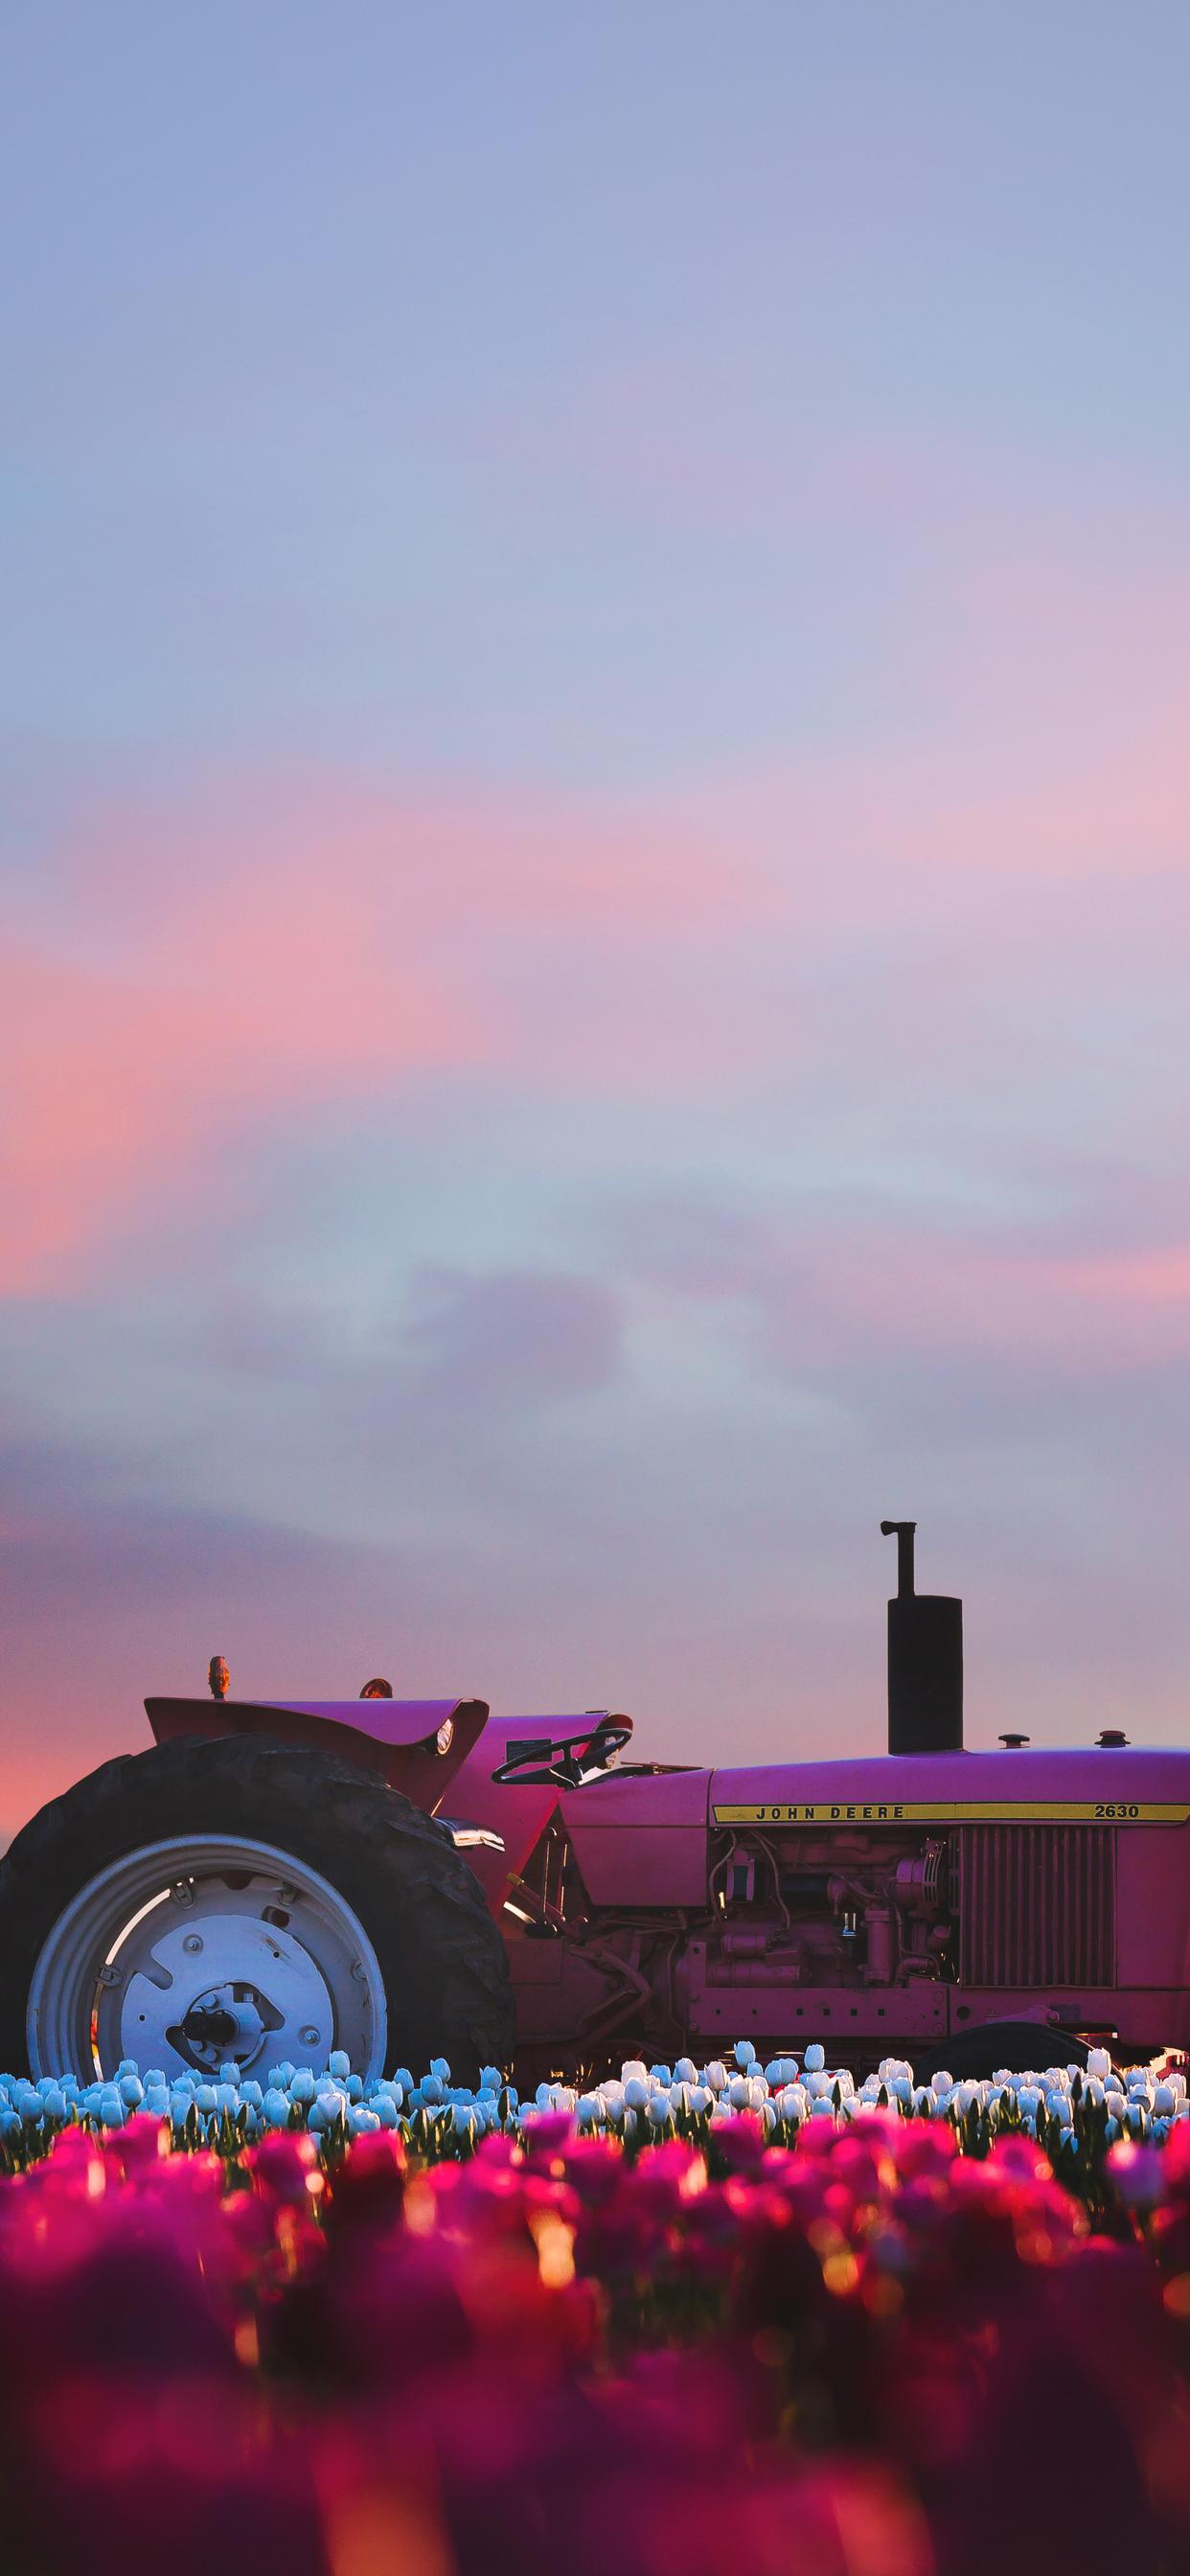 1242x2688 John Deere Tractor In Flower Farm 4k Iphone Xs Max Hd 4k